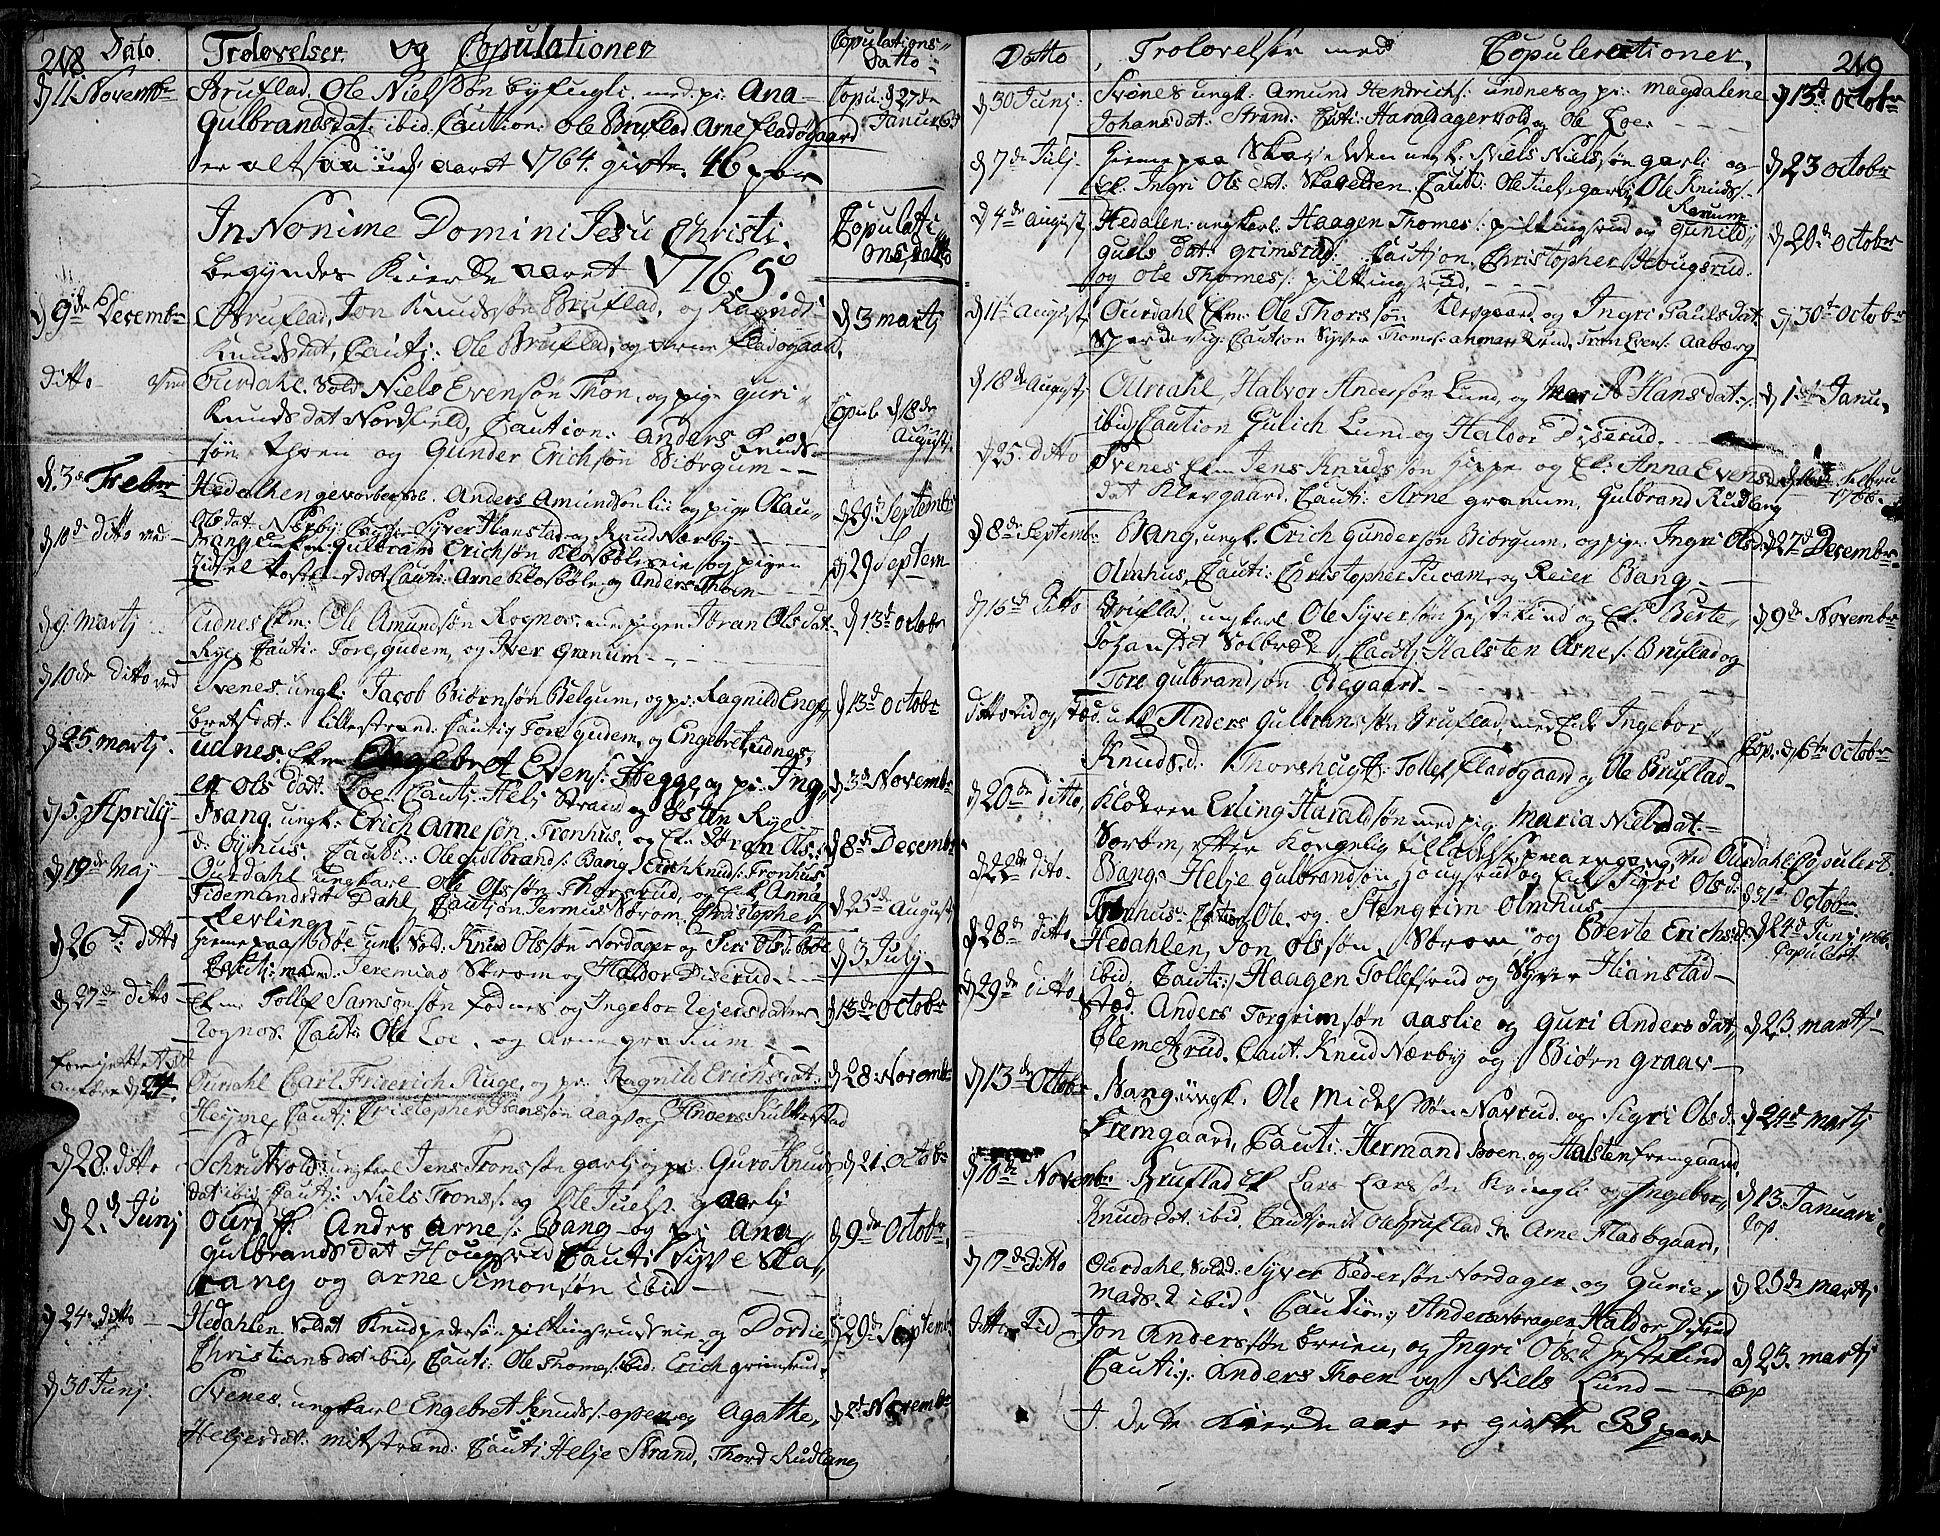 SAH, Aurdal prestekontor, Ministerialbok nr. 5, 1763-1781, s. 218-219